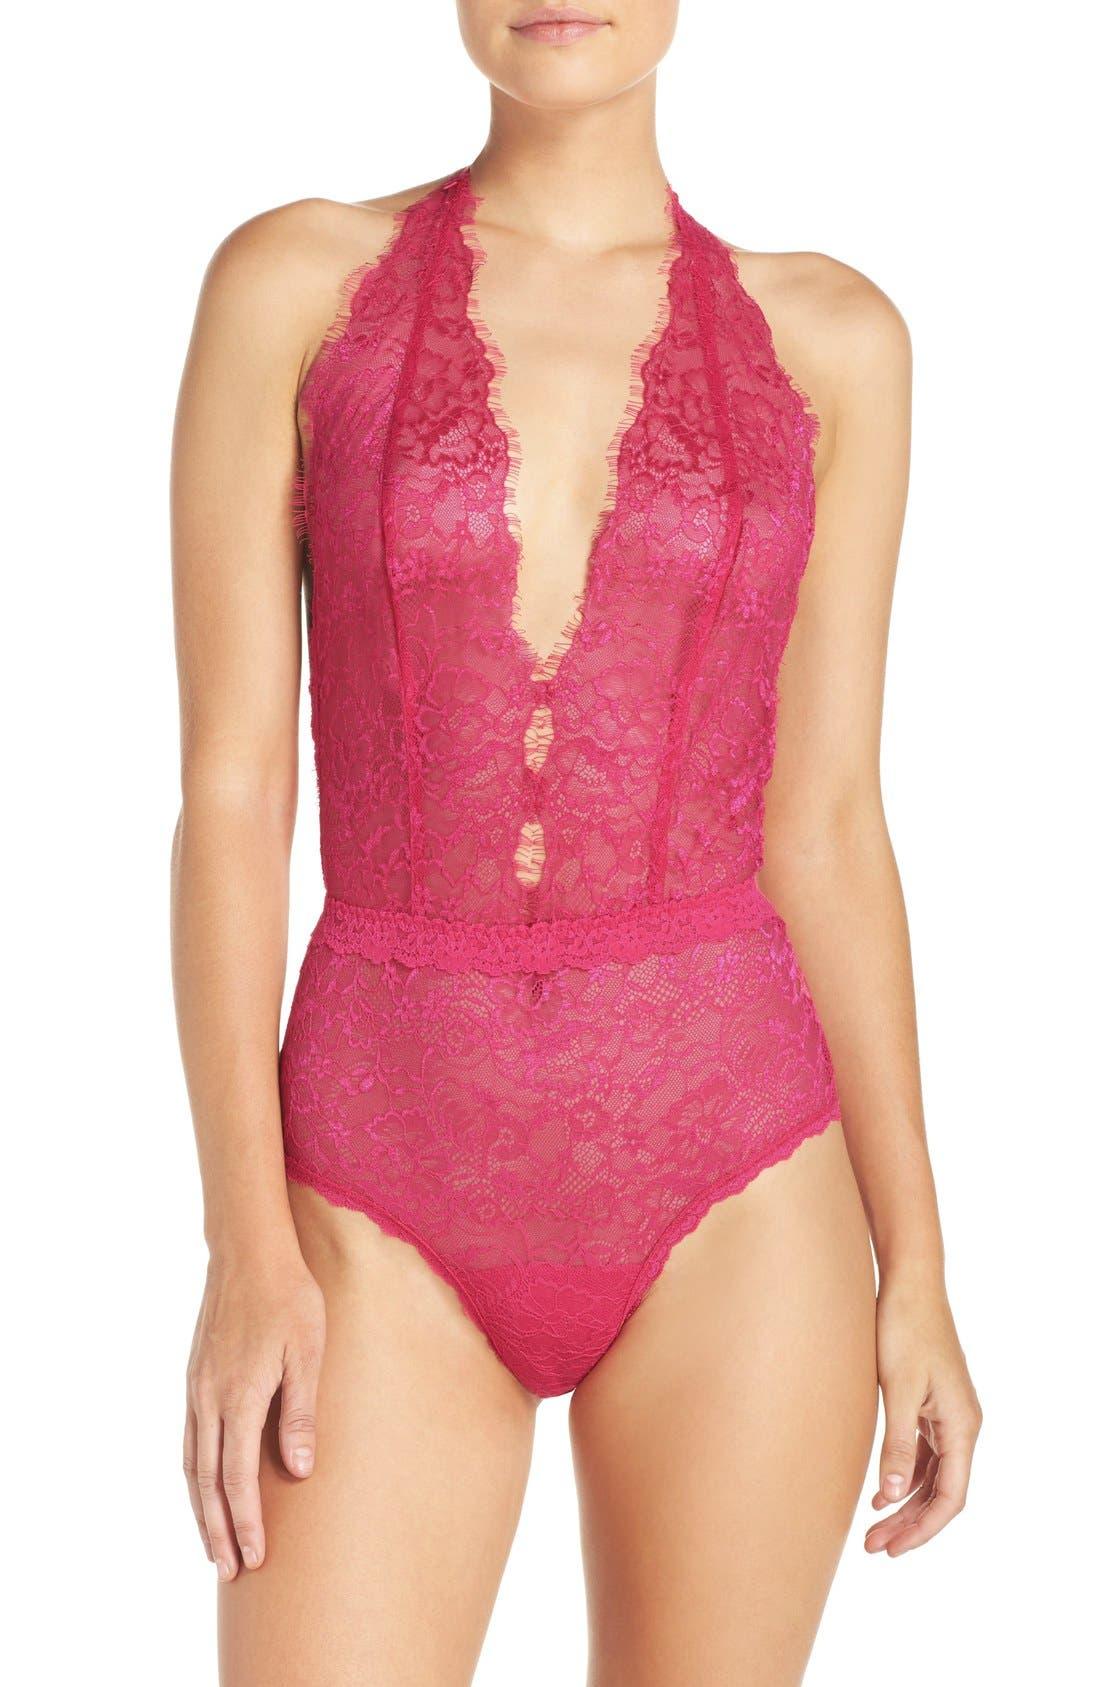 Alternate Image 1 Selected - Hanky Panky 'Wink' Halter Lace Bodysuit